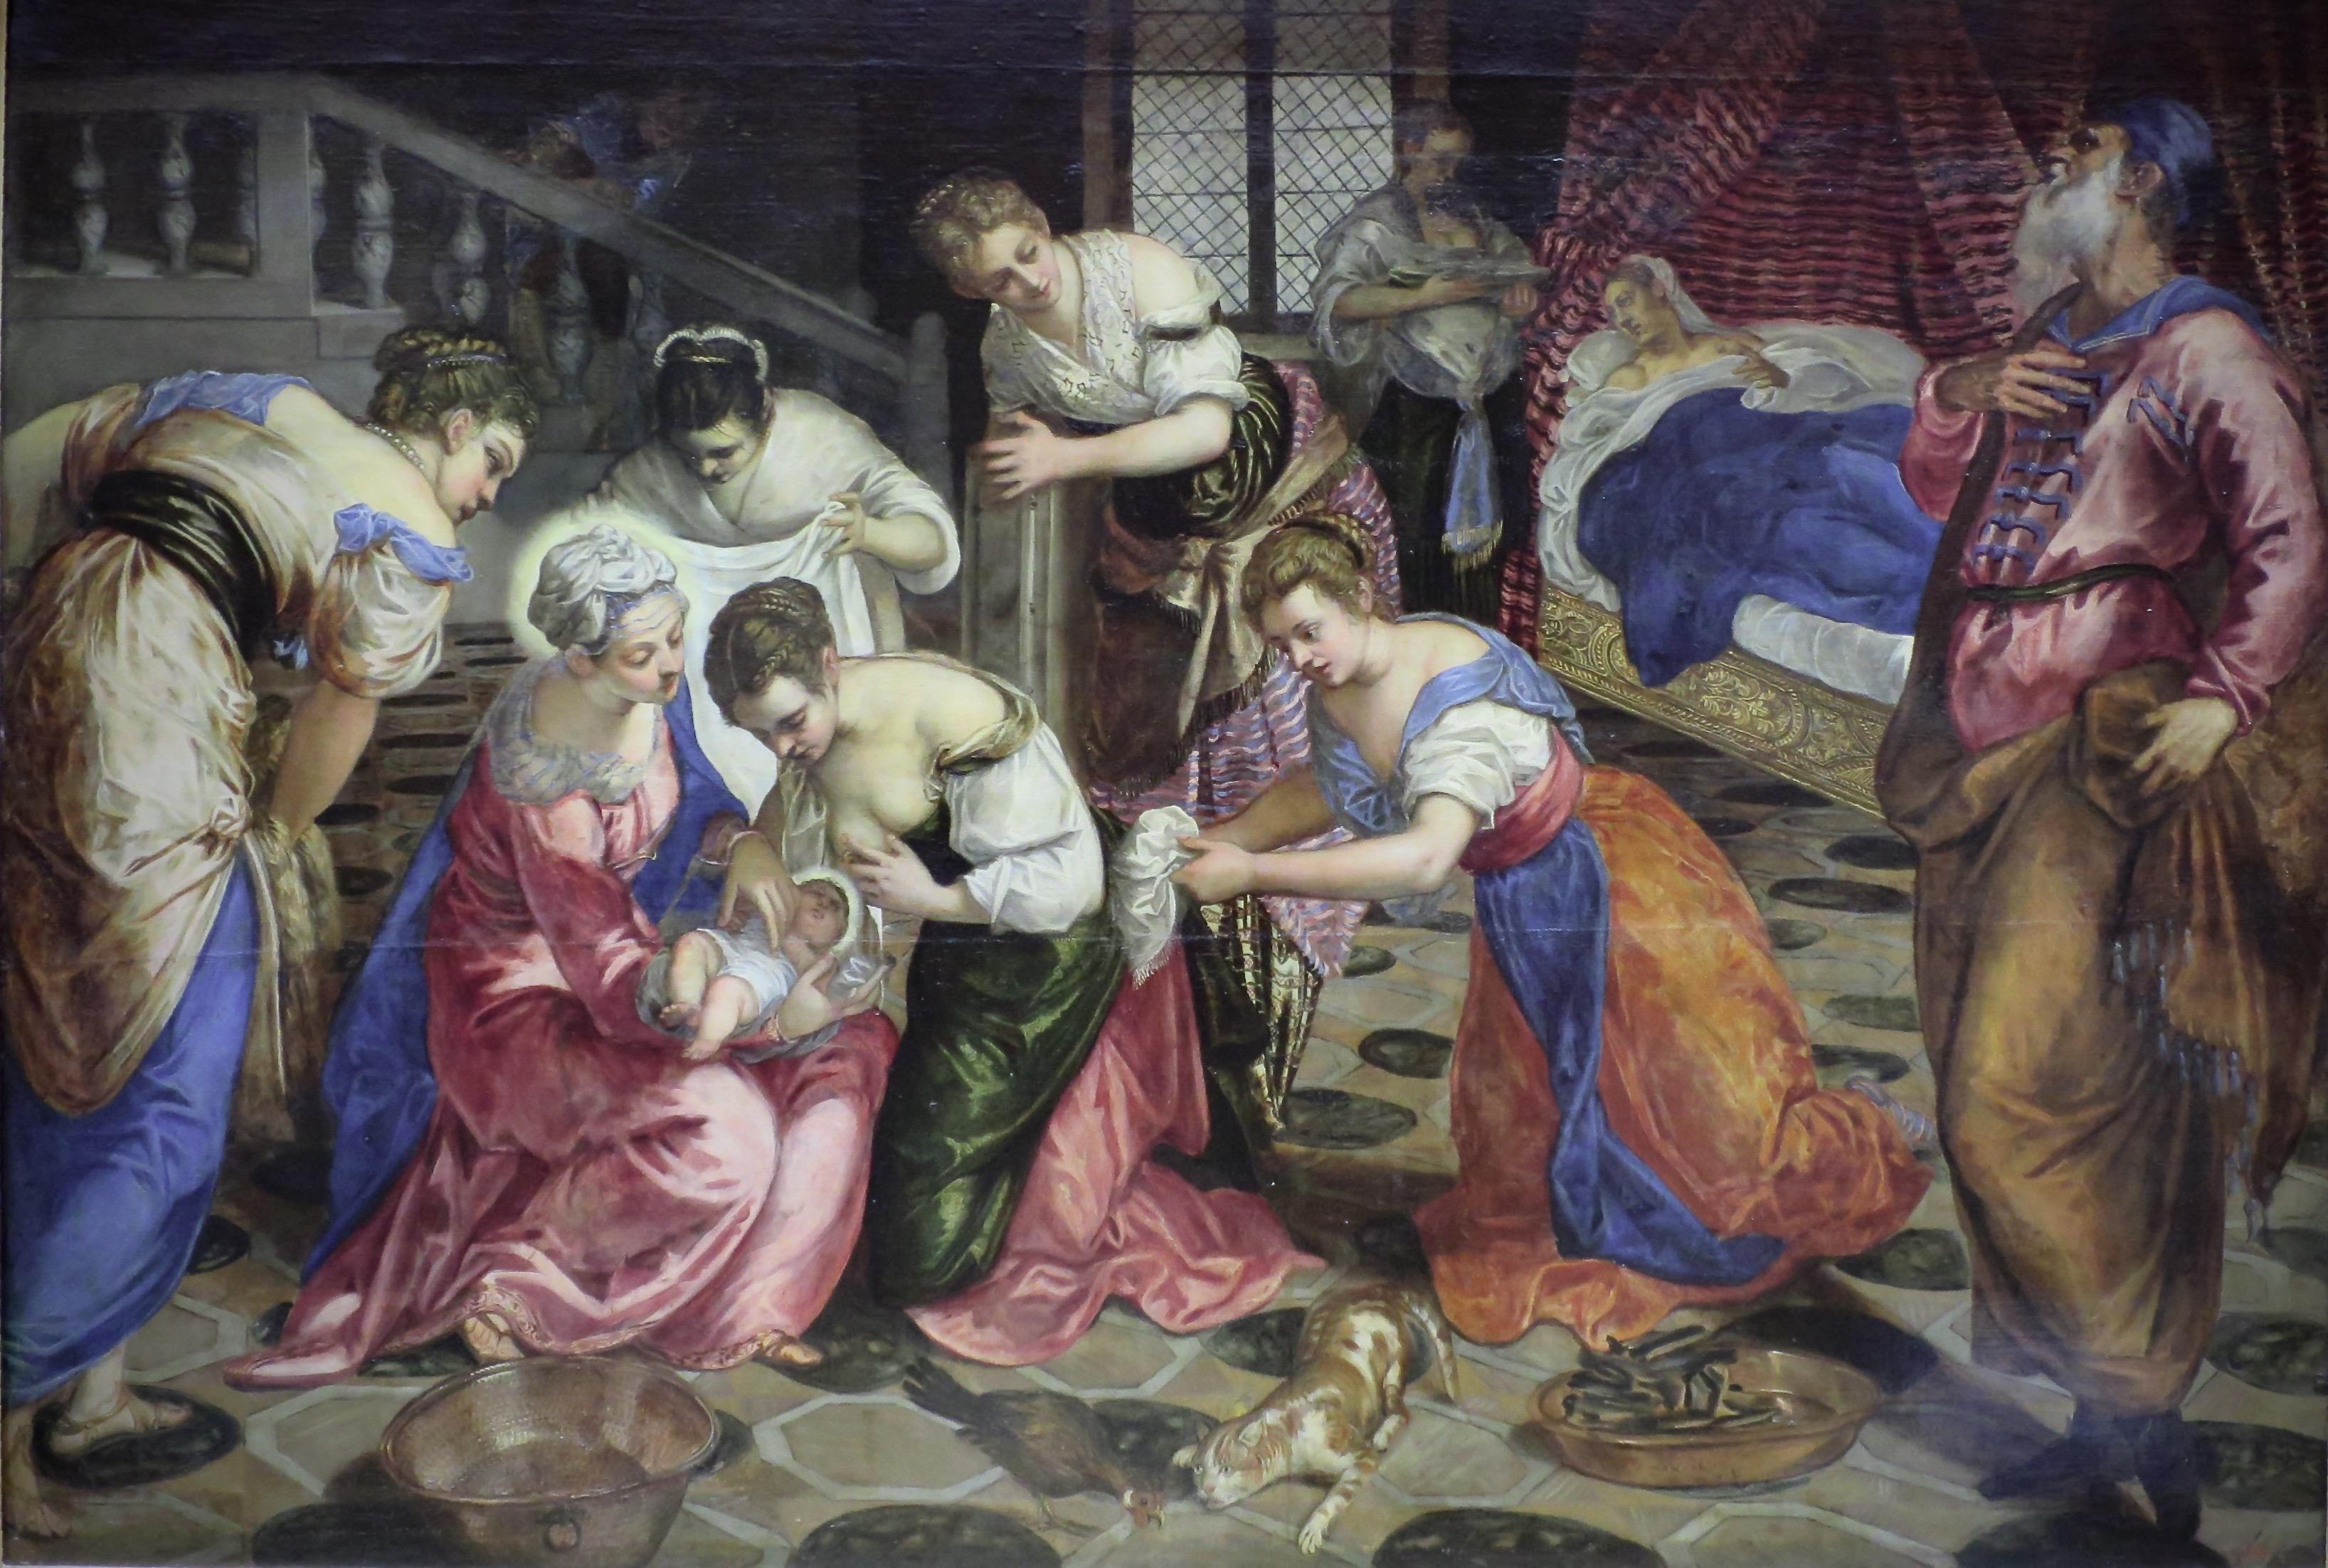 Jacopo_Tintoretto_-_The_Birth_of_John_the_Baptist_-_WGA22441